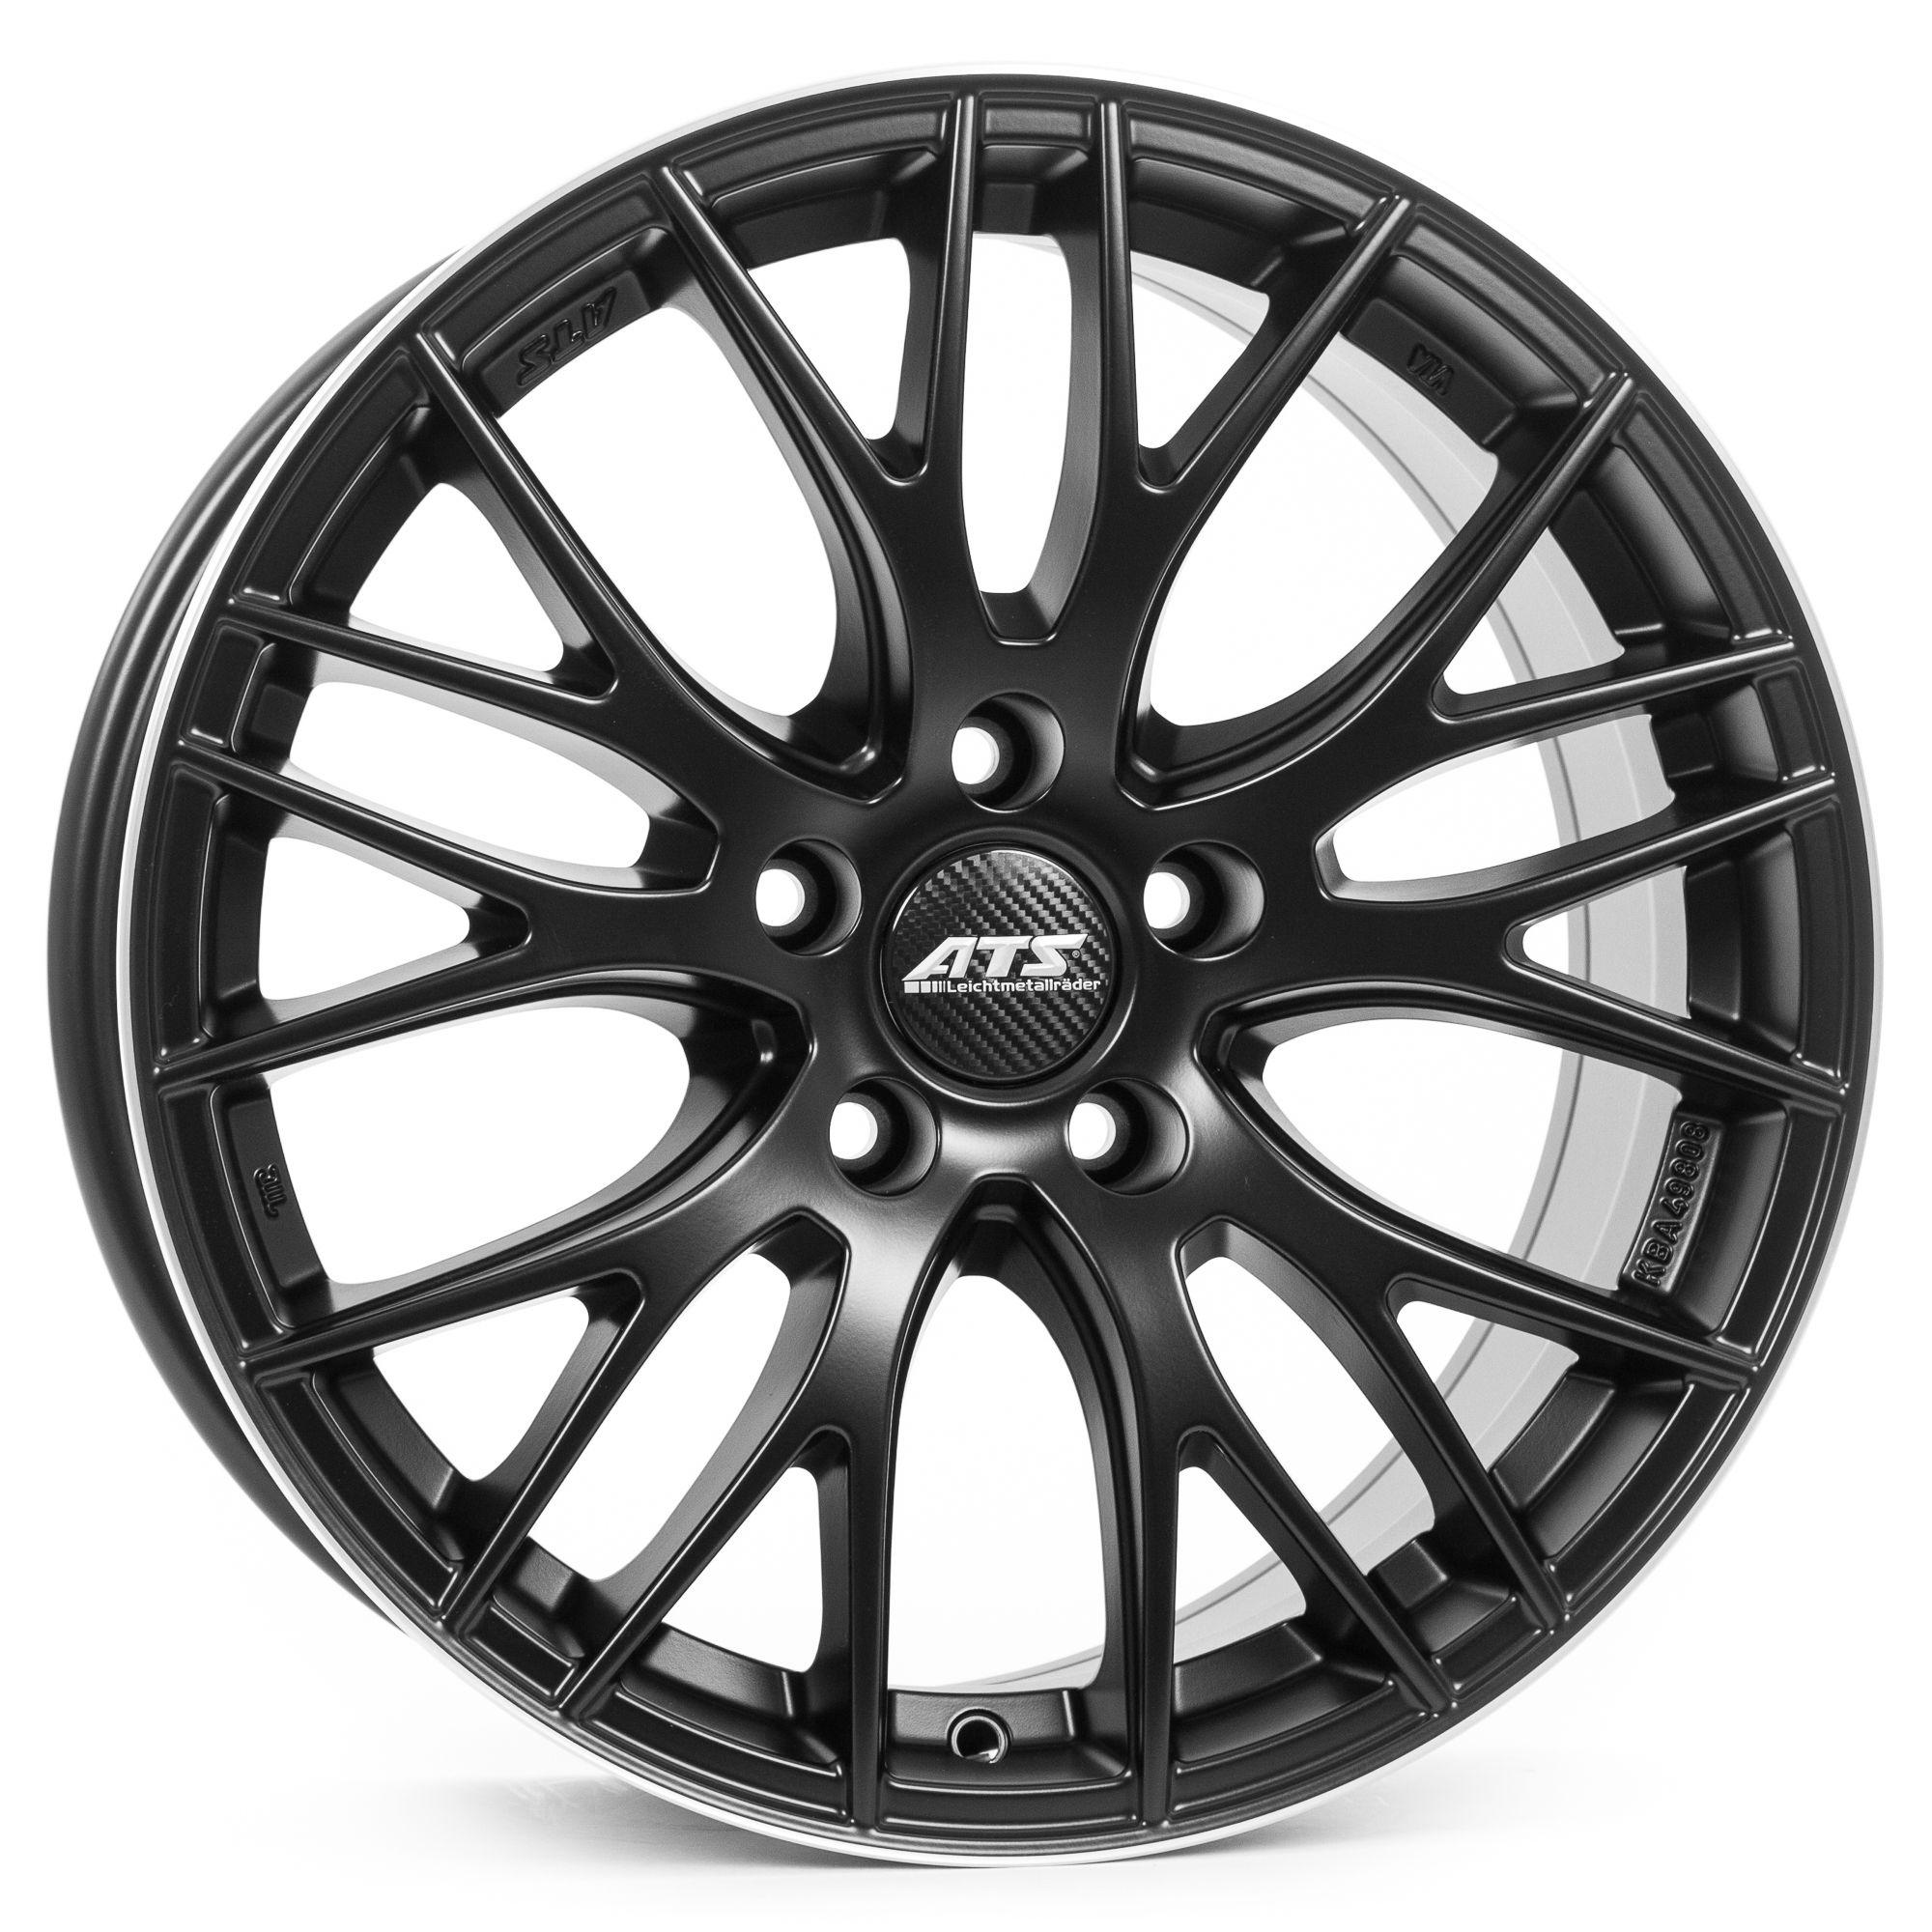 ATS Perfektion Felgen racing-schwarz / Horn poliert in 18